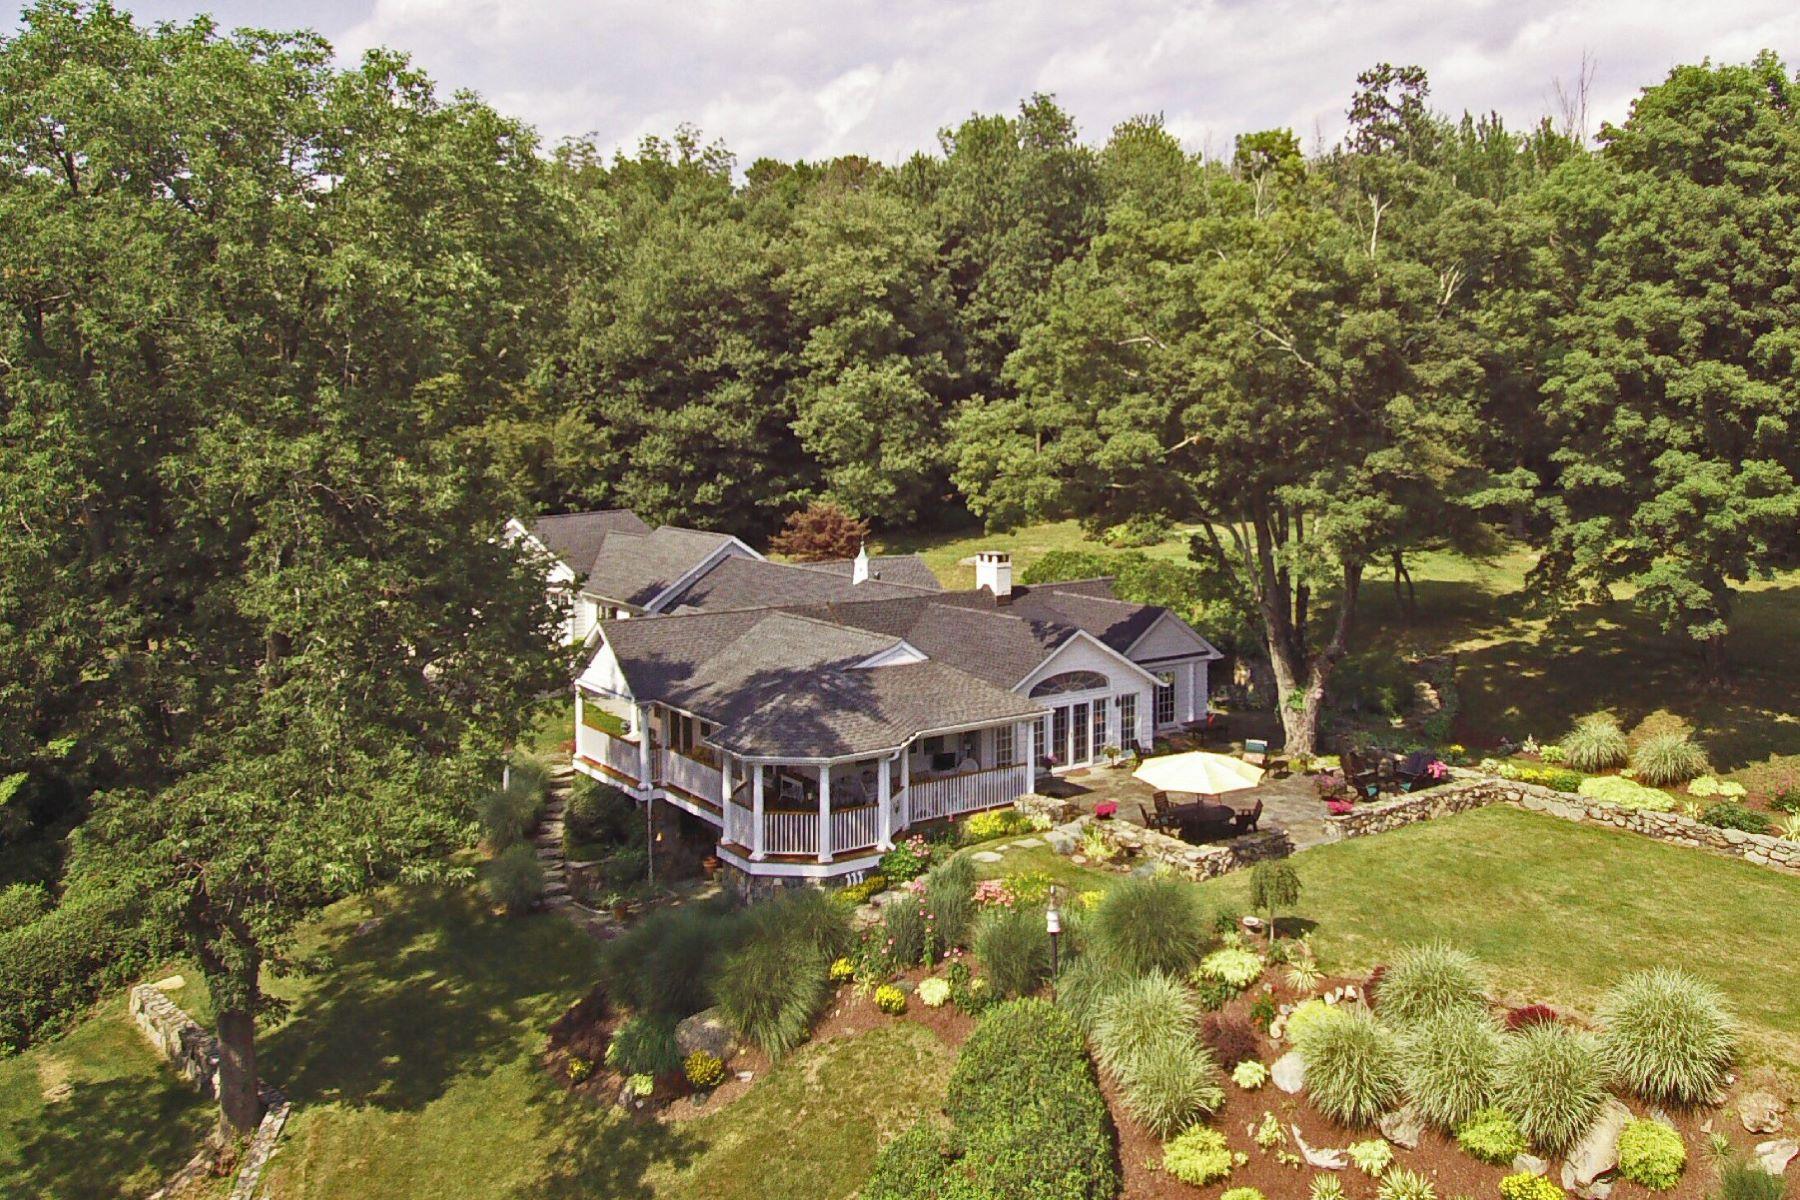 Casa para uma família para Venda às Casually Elegant 162 Spring Valley Road Ridgefield, Connecticut 06877 Estados Unidos